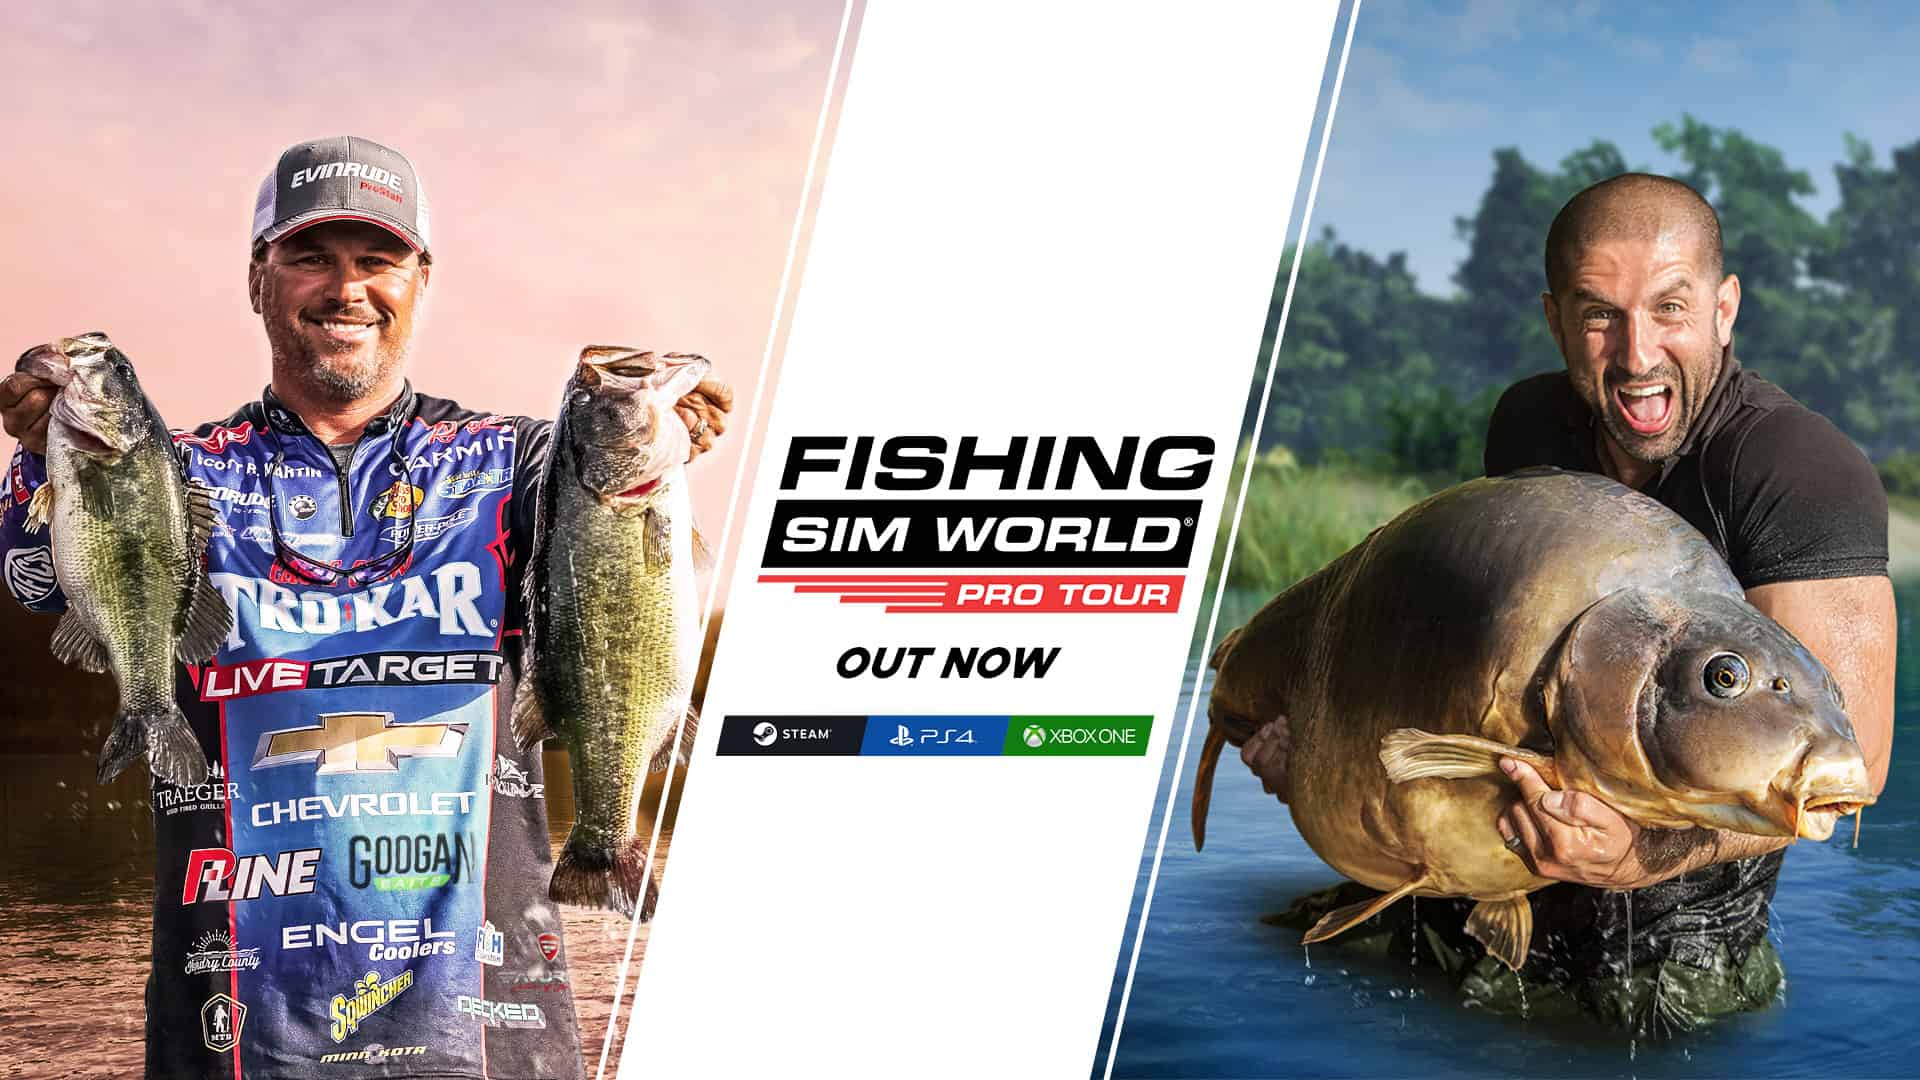 What Is Fishing Sim World Pro Tour